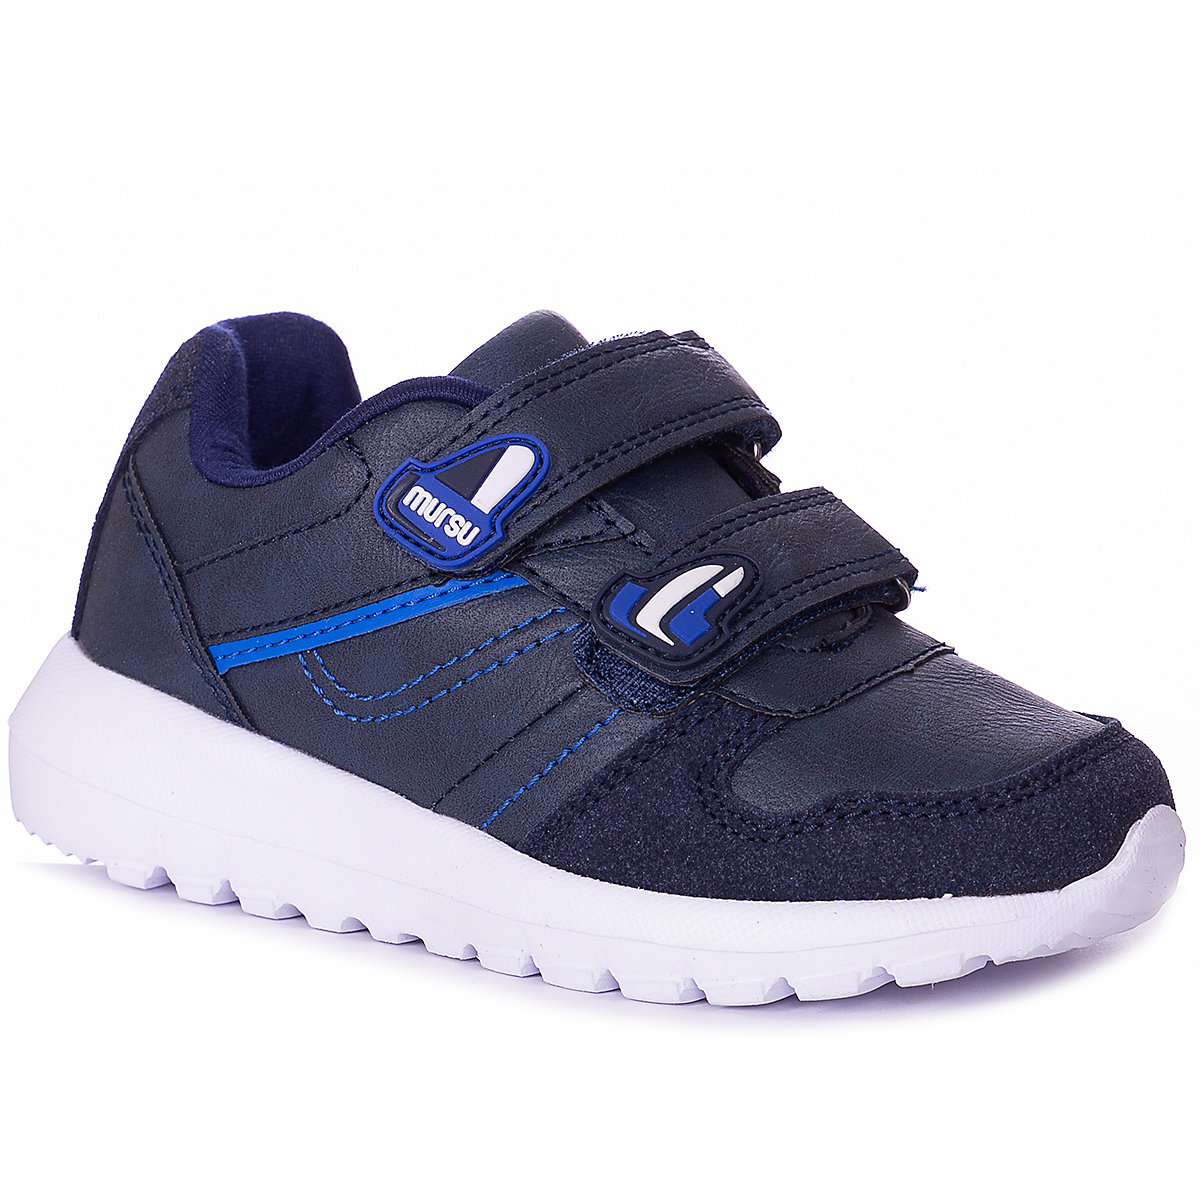 Фото - MURSU Kids' Sneakers 10612082 10612088 children's sports running shoes Spring Autumn Boys Boy 2017 men s autumn running sports suit